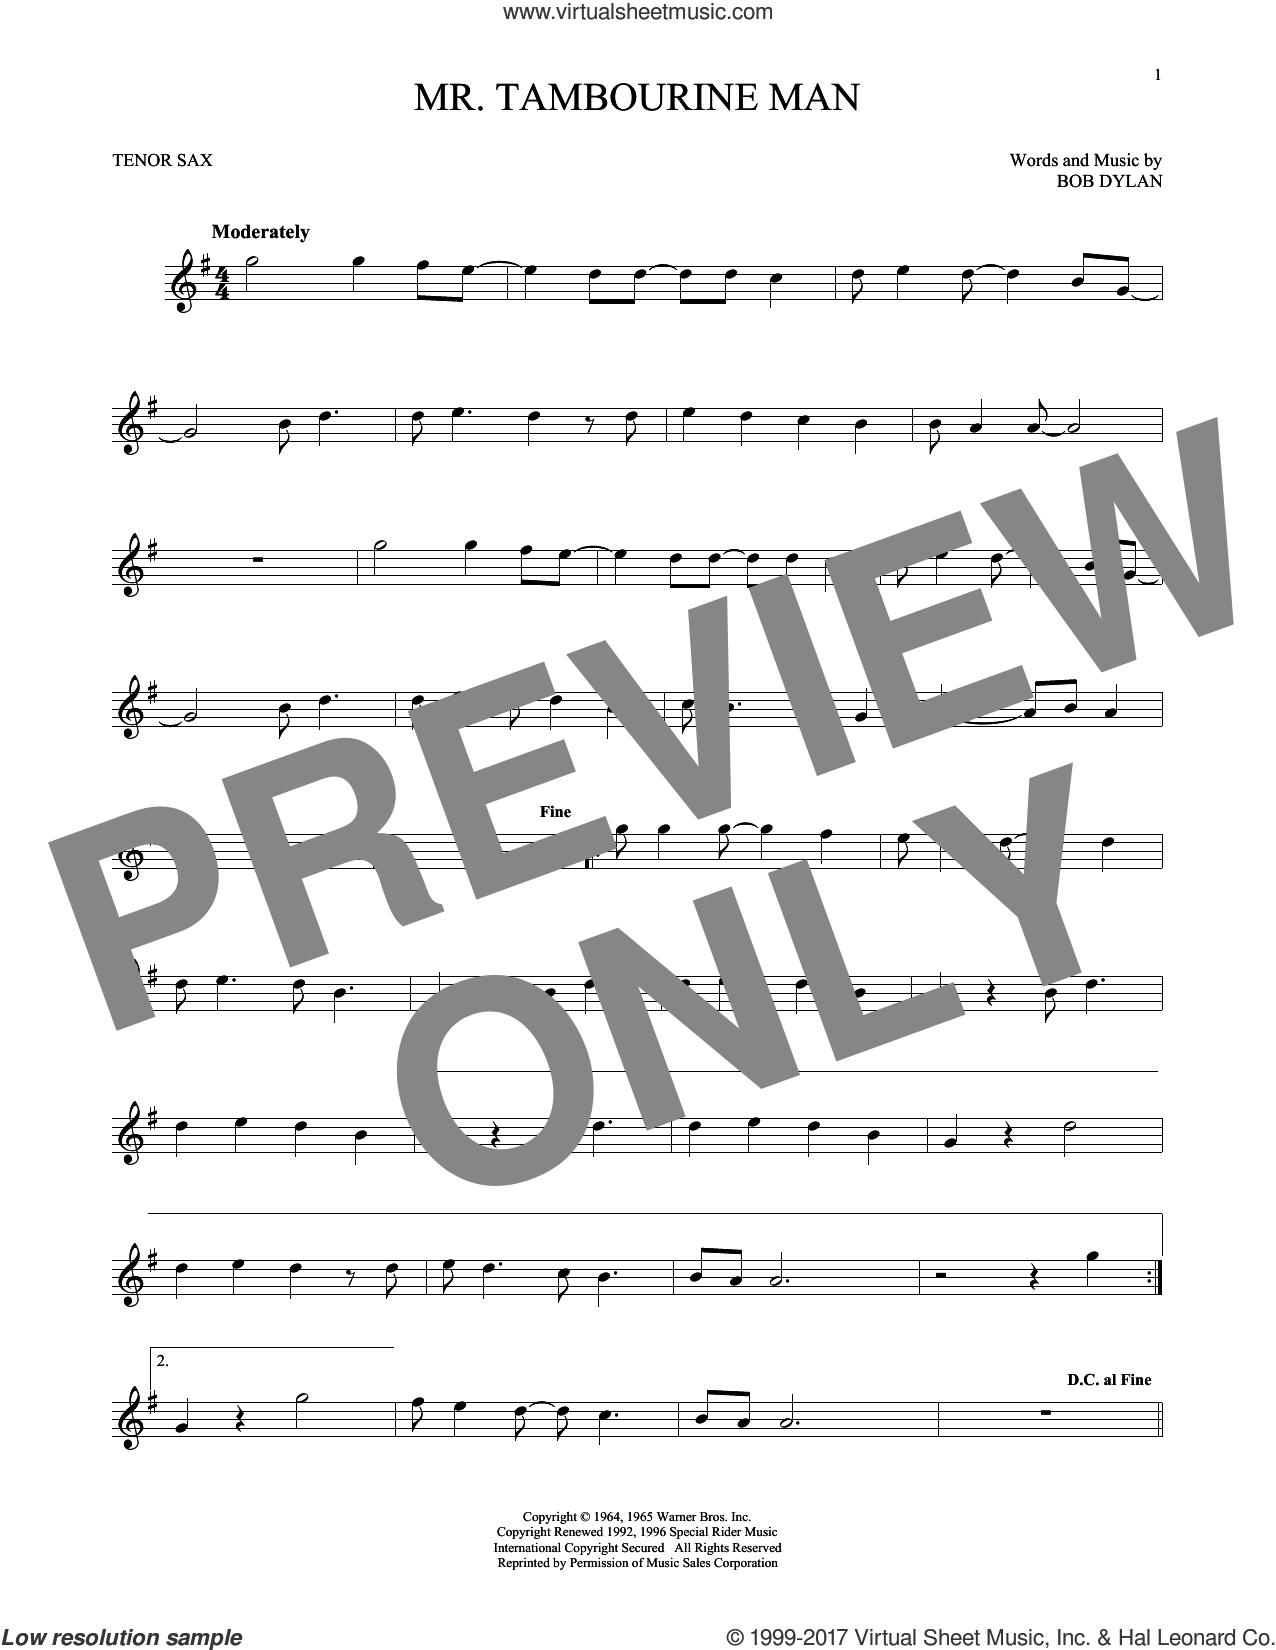 Mr. Tambourine Man sheet music for tenor saxophone solo by Bob Dylan, intermediate skill level